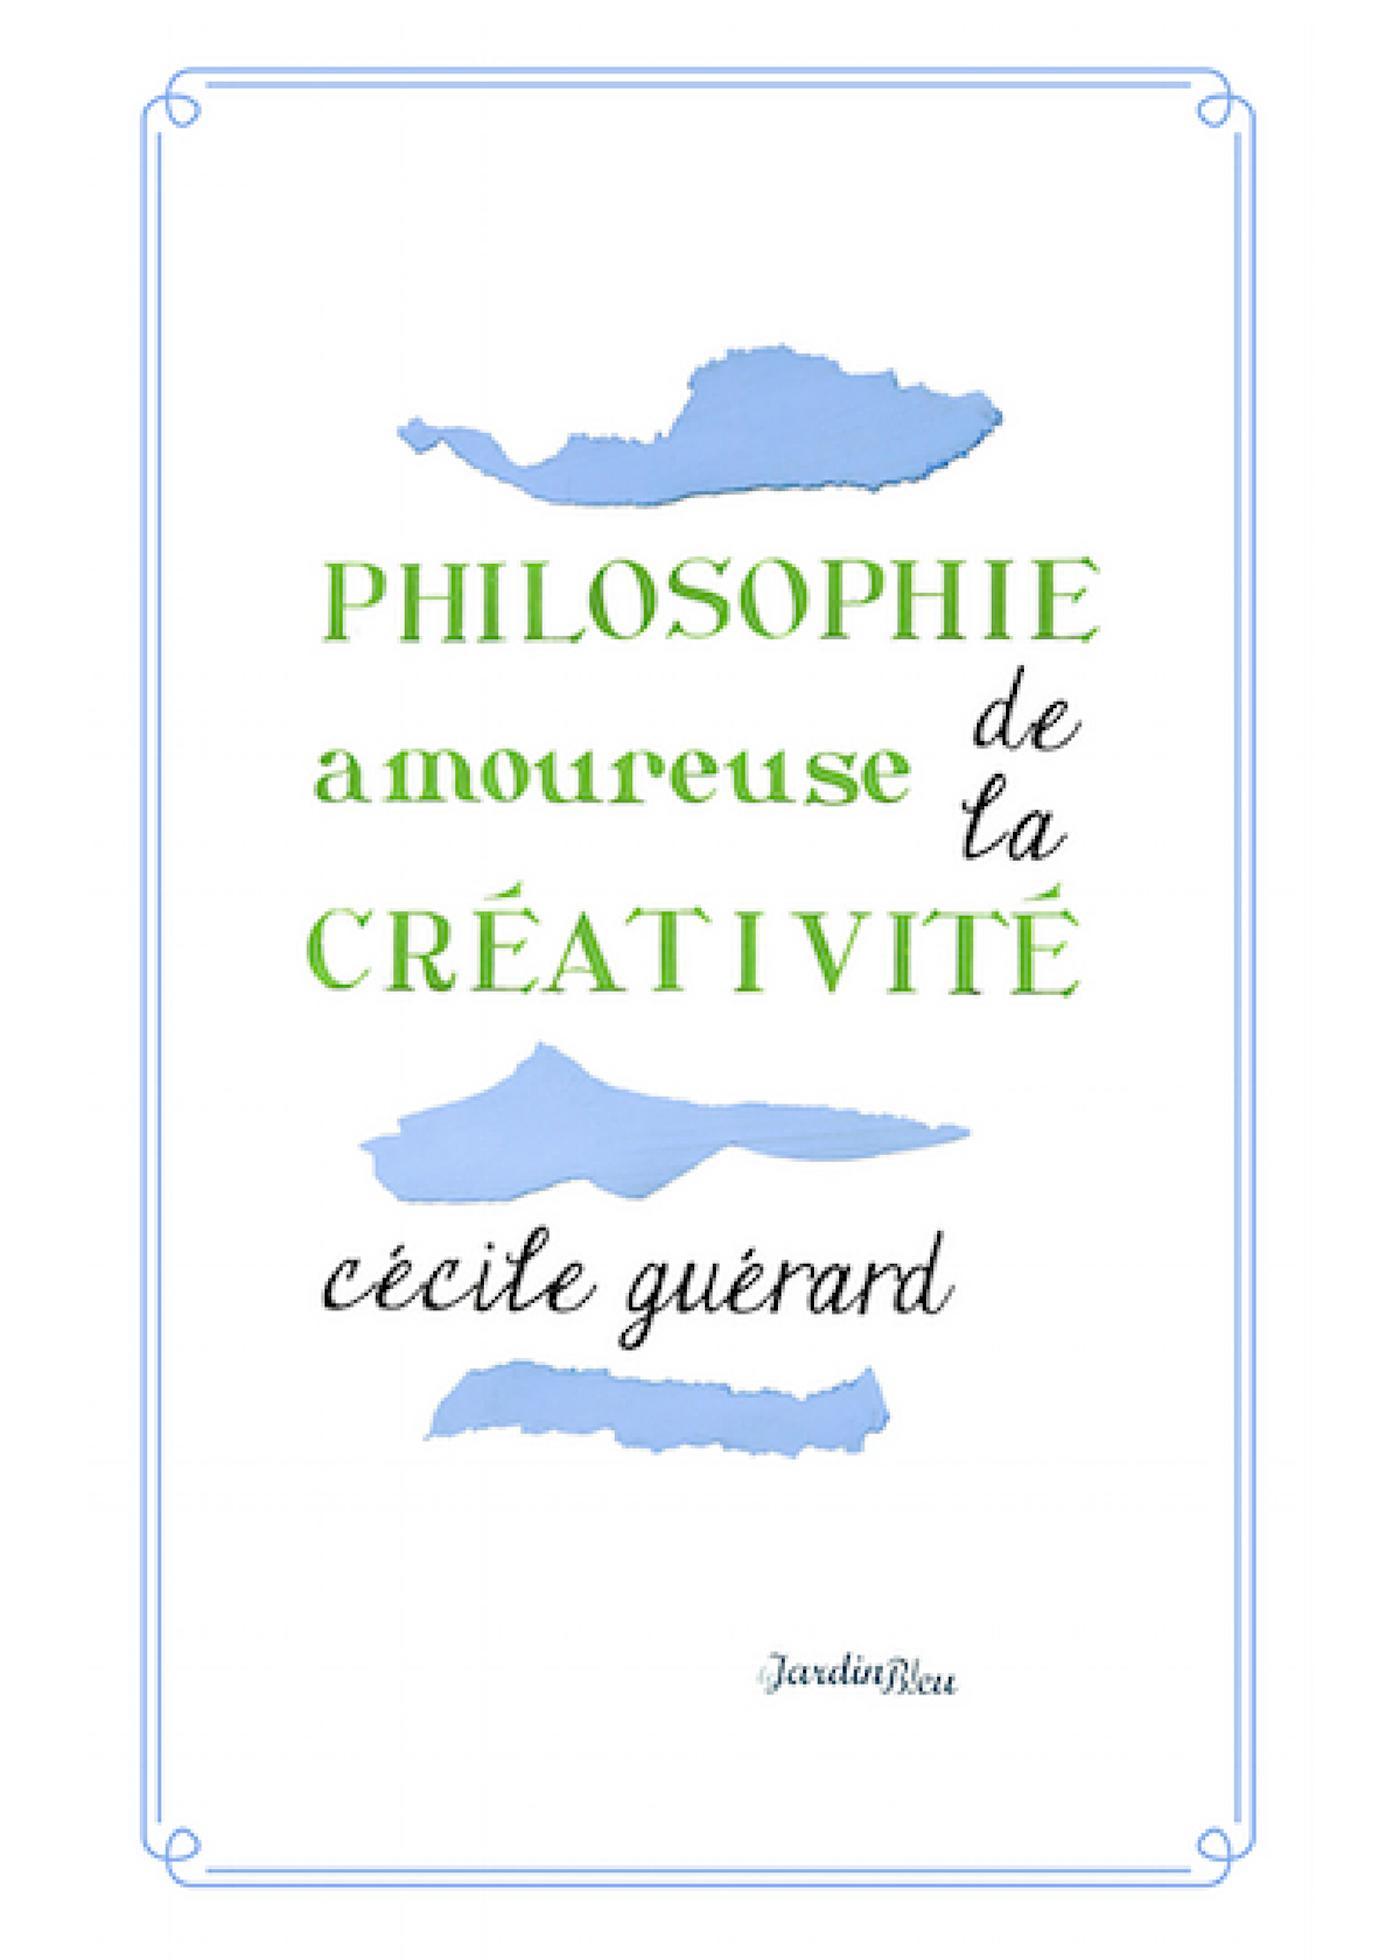 Philosophie amoureuse de la créativité